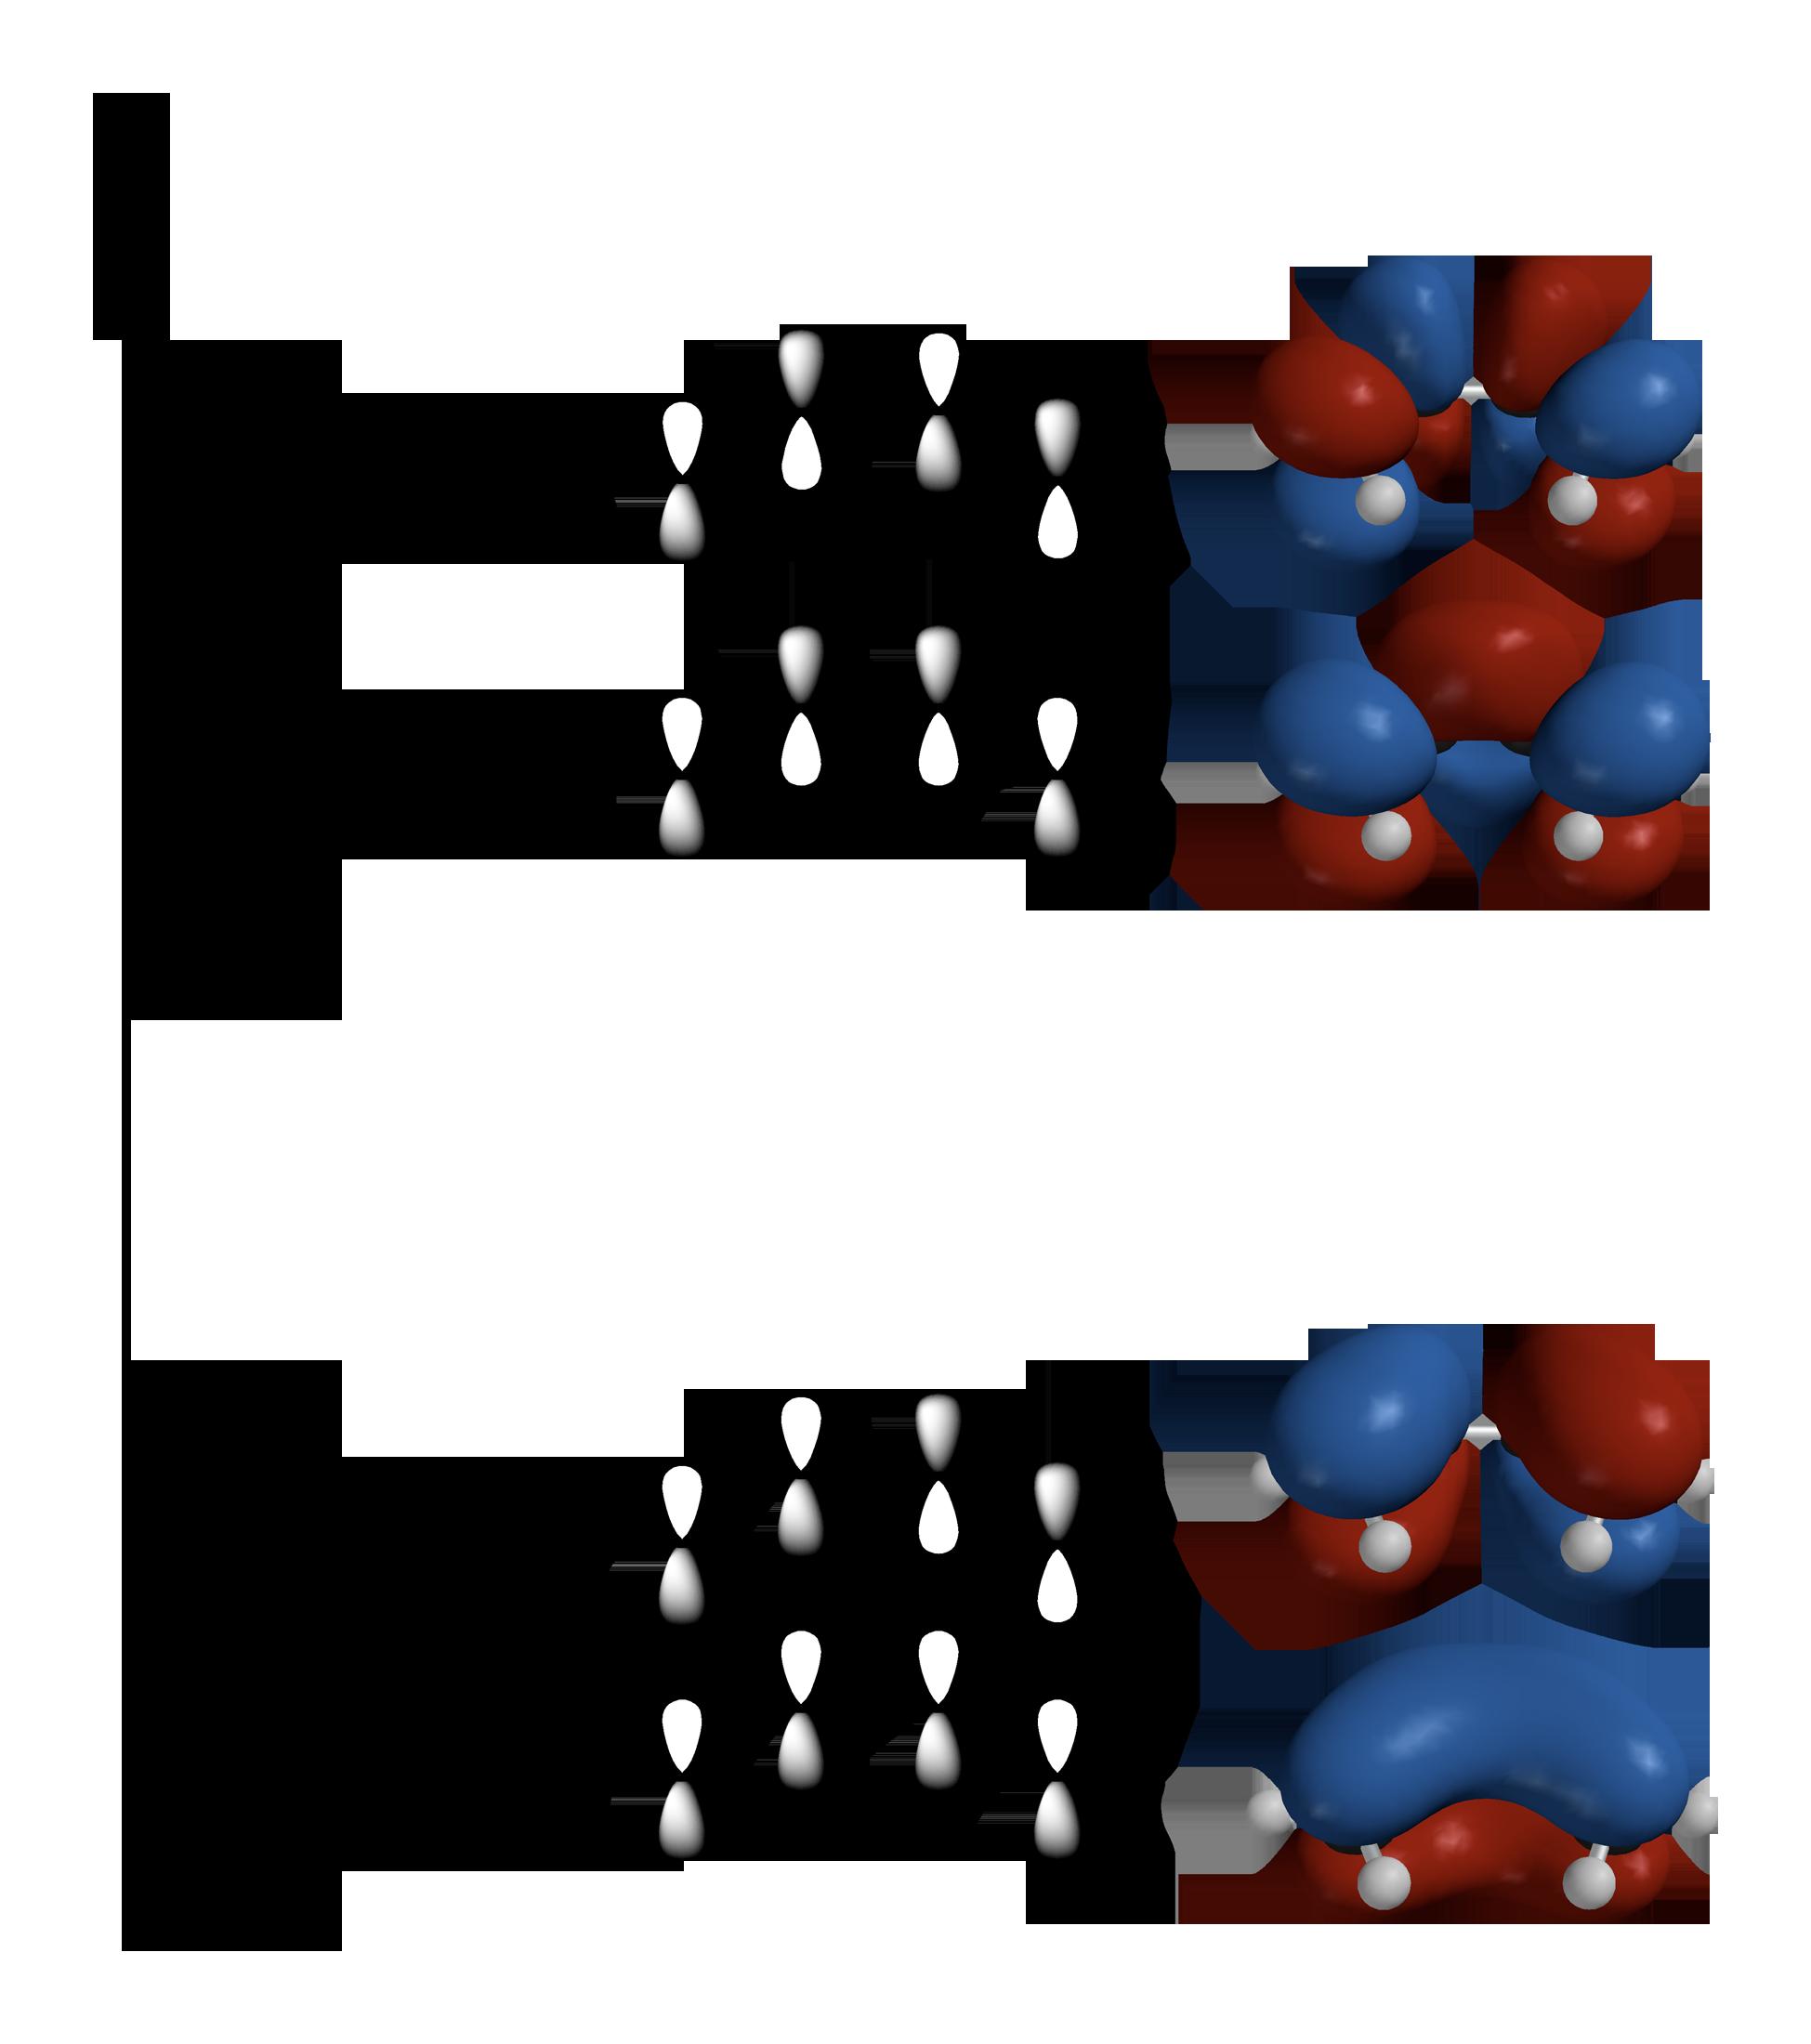 Ethene Molecular Orbitals Butadiene Molecular Orbitals